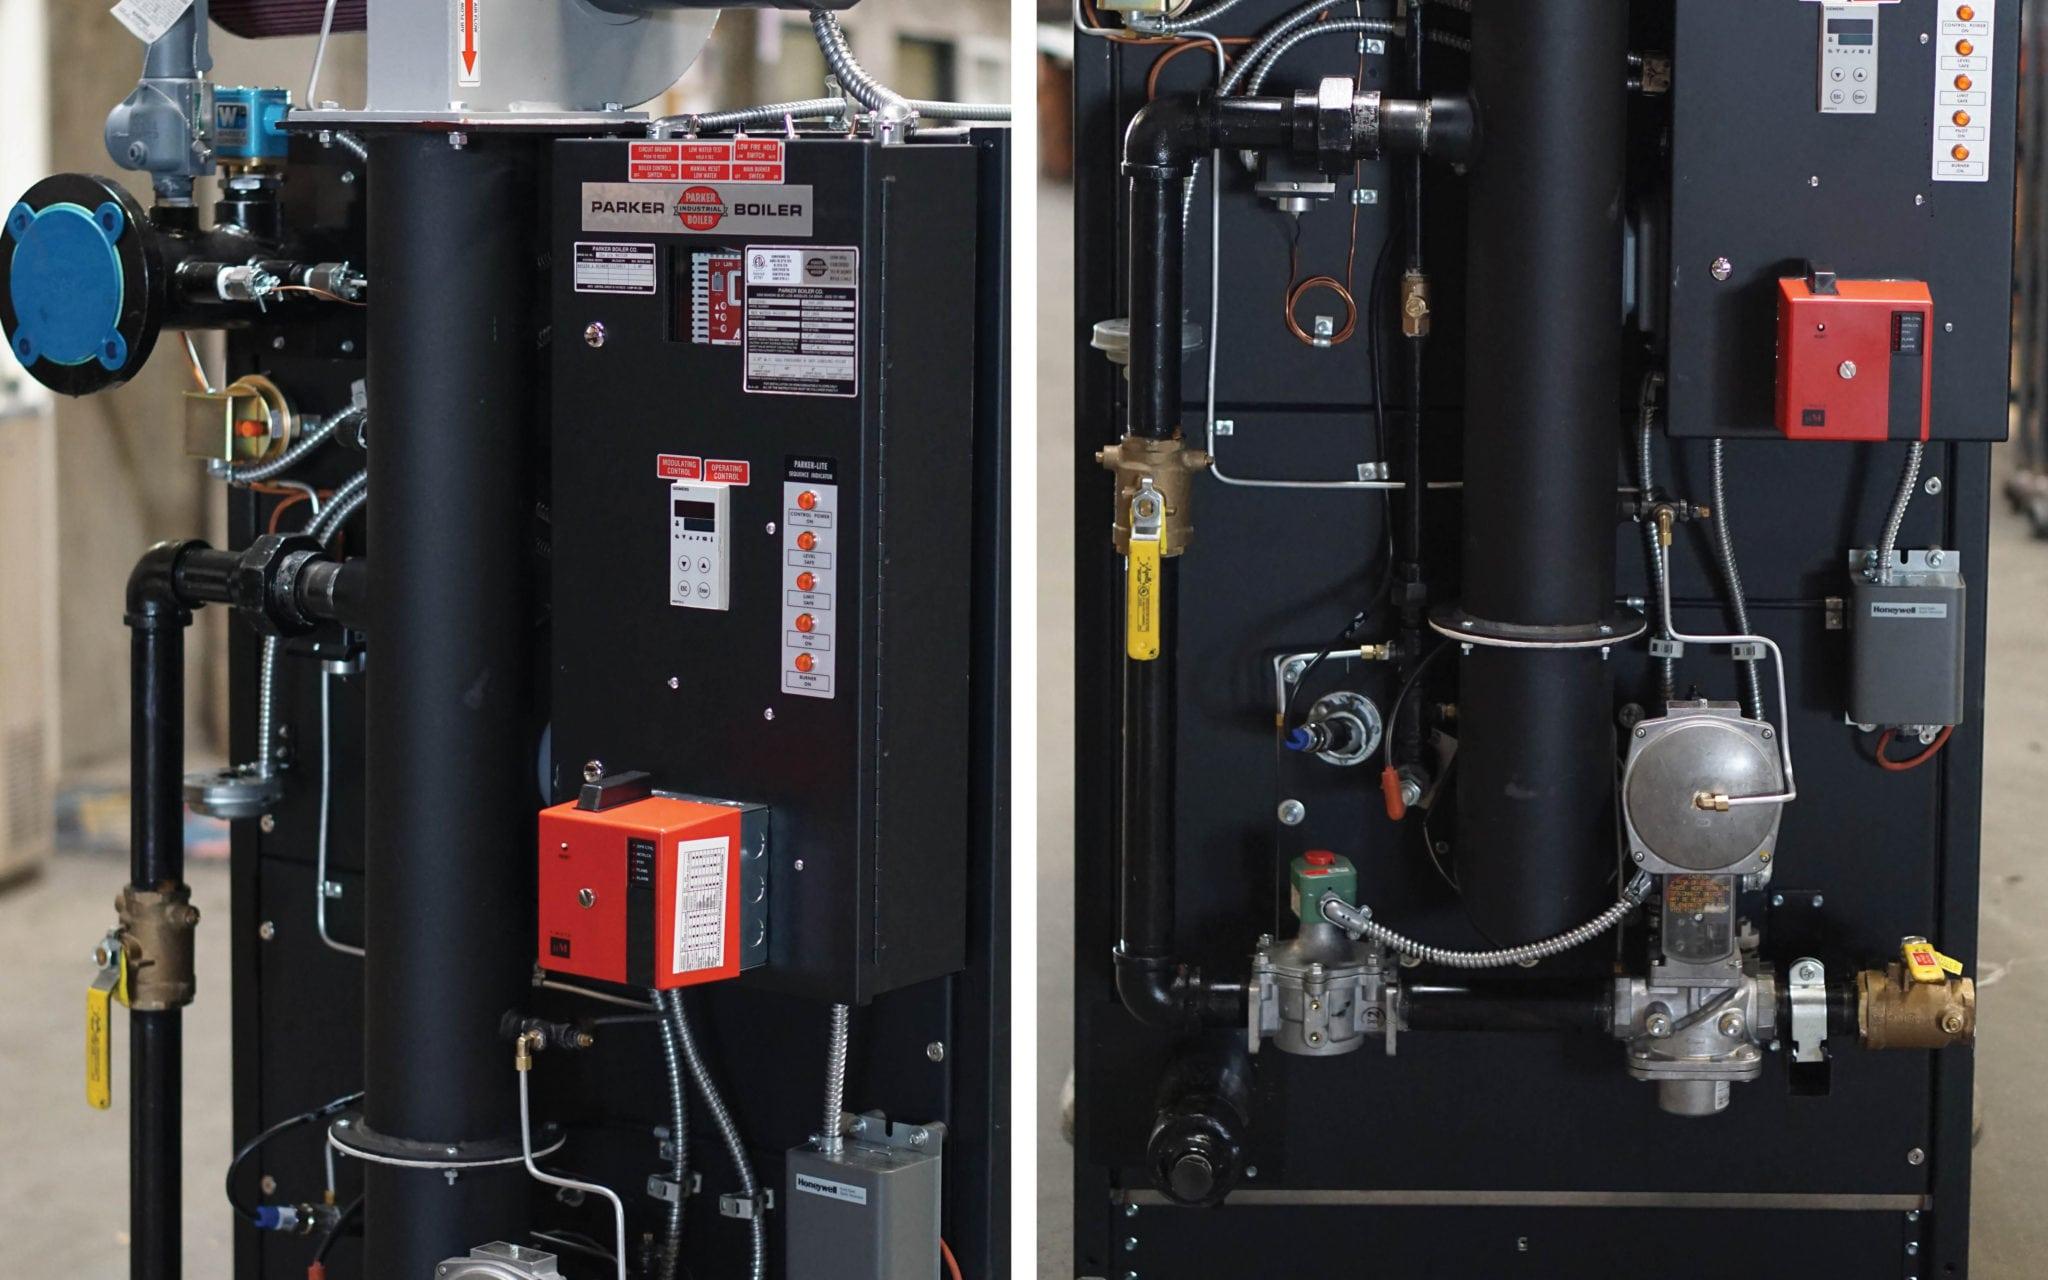 Hot Water Boilers - Parker Boiler Co. | Industrial & Commercial Boilers